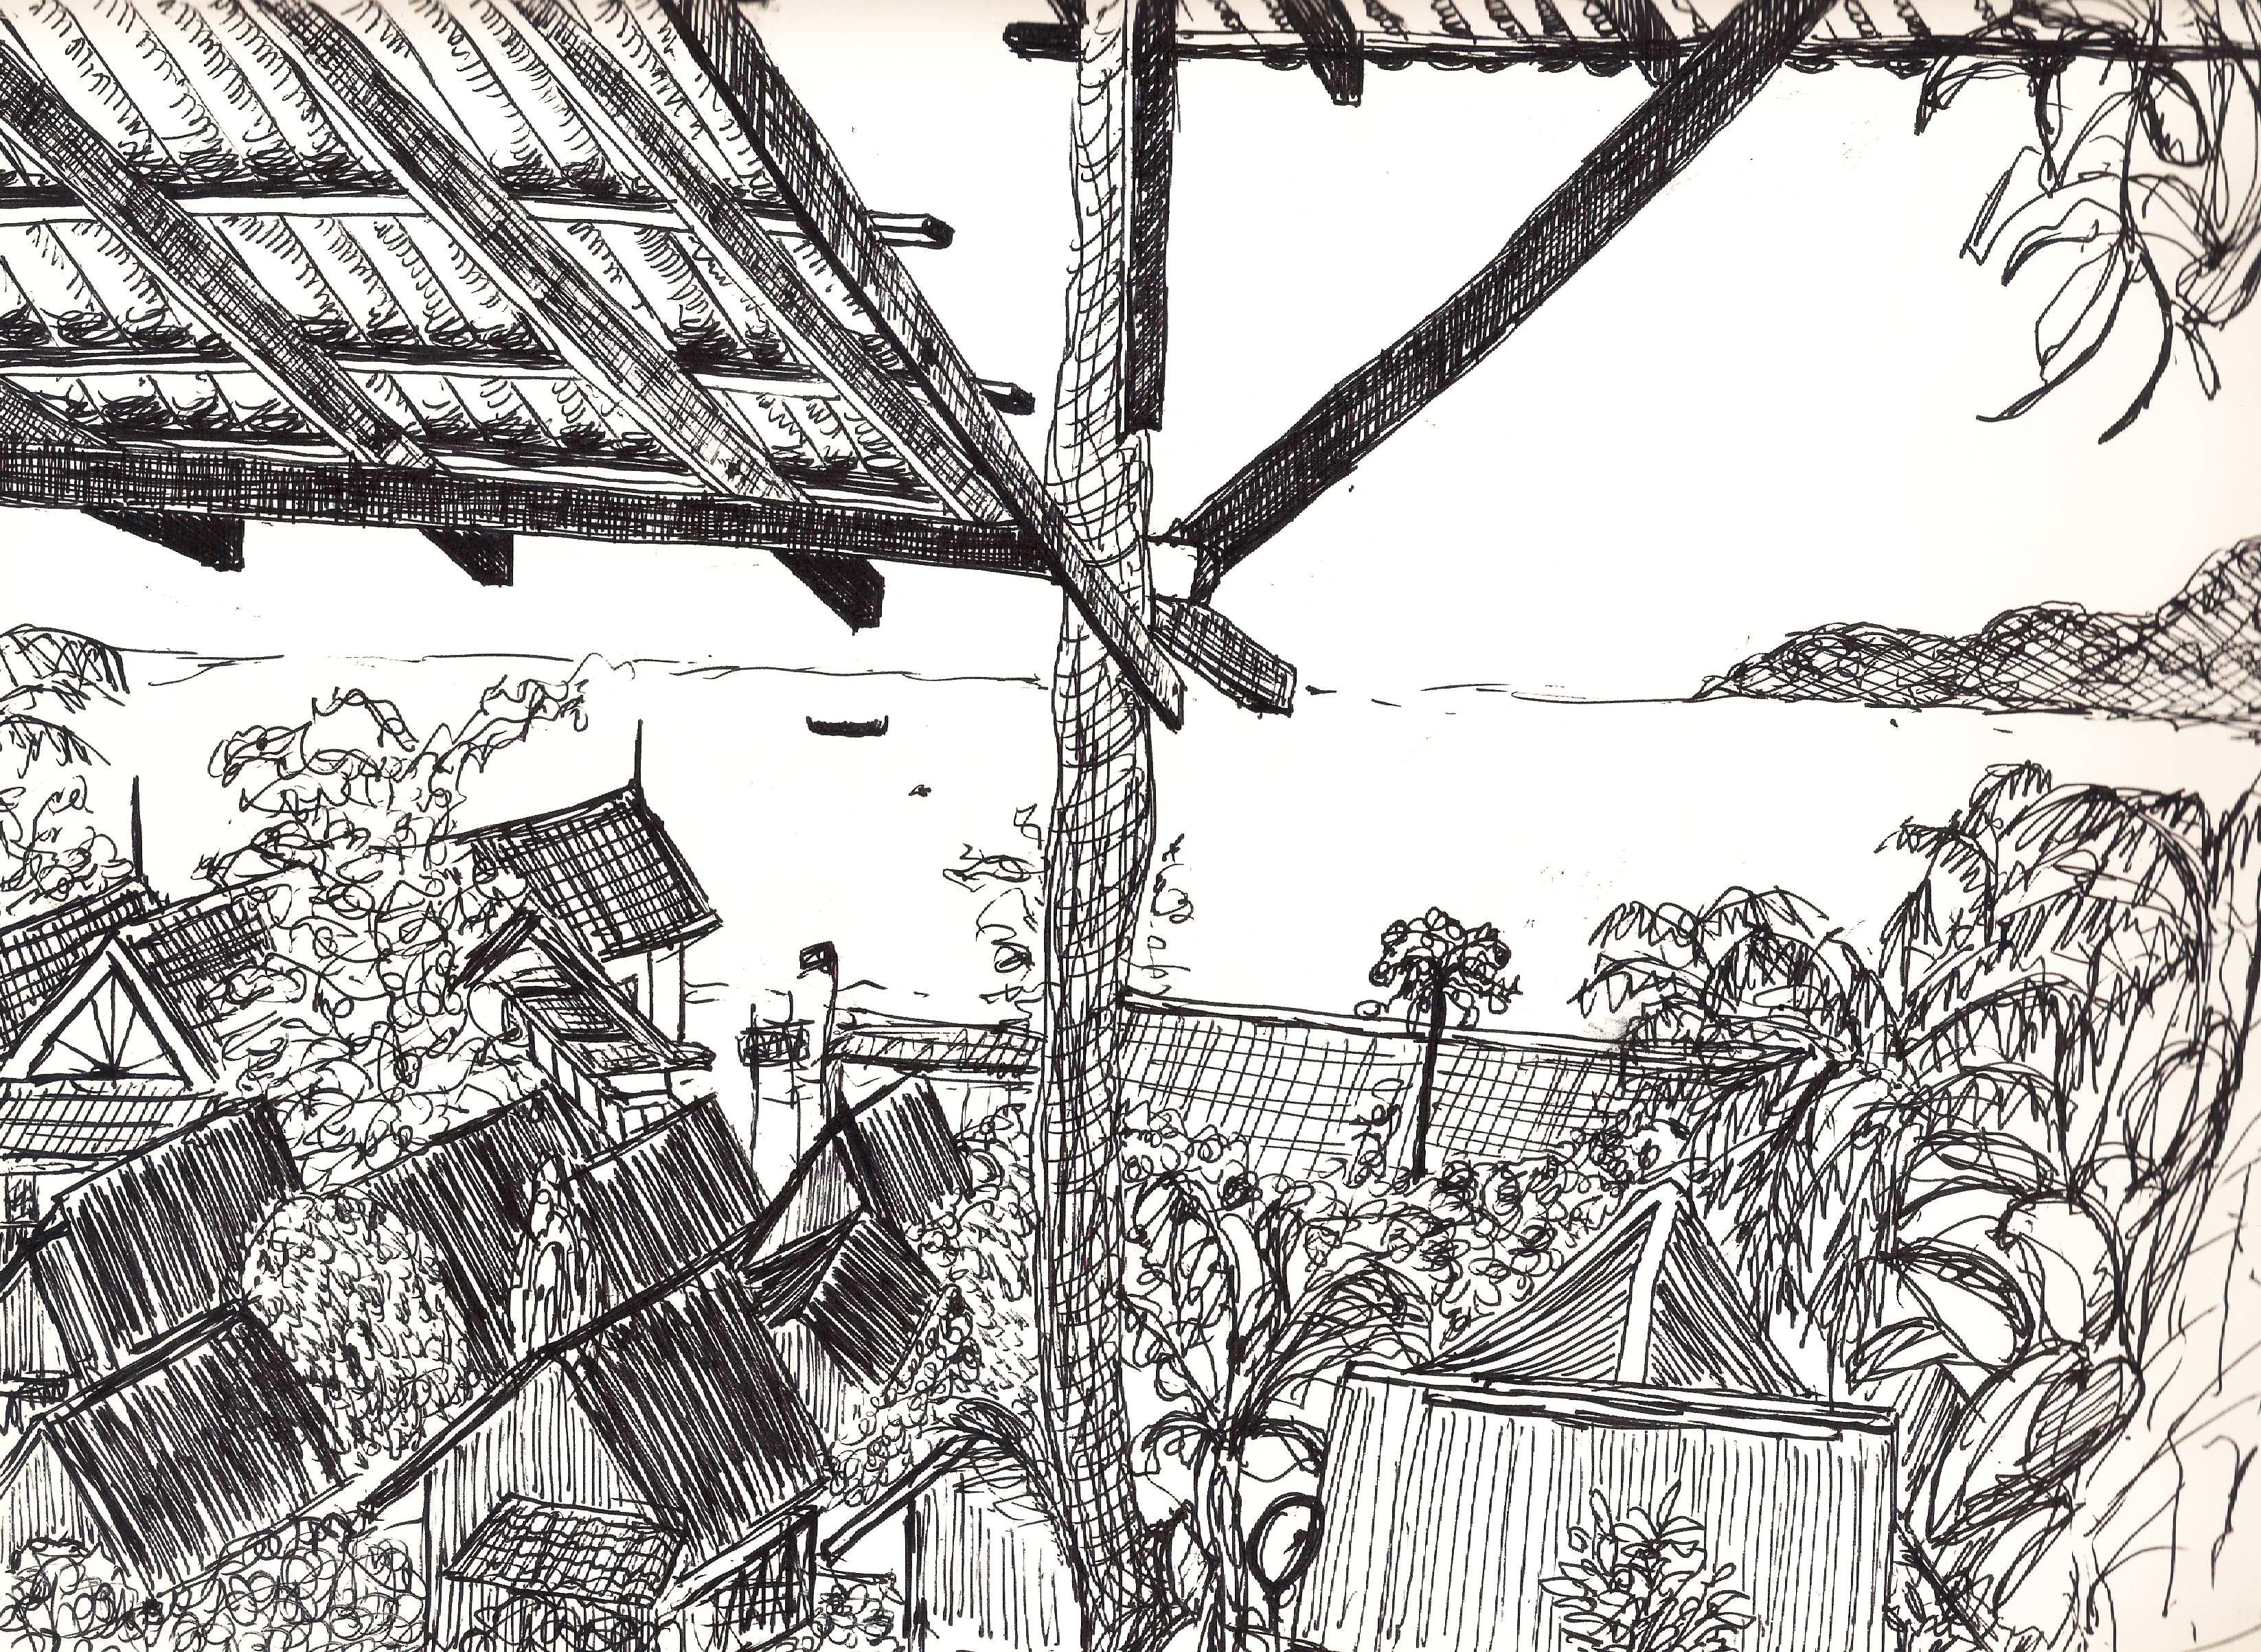 Perhentian ink sketch by Vickie Chan